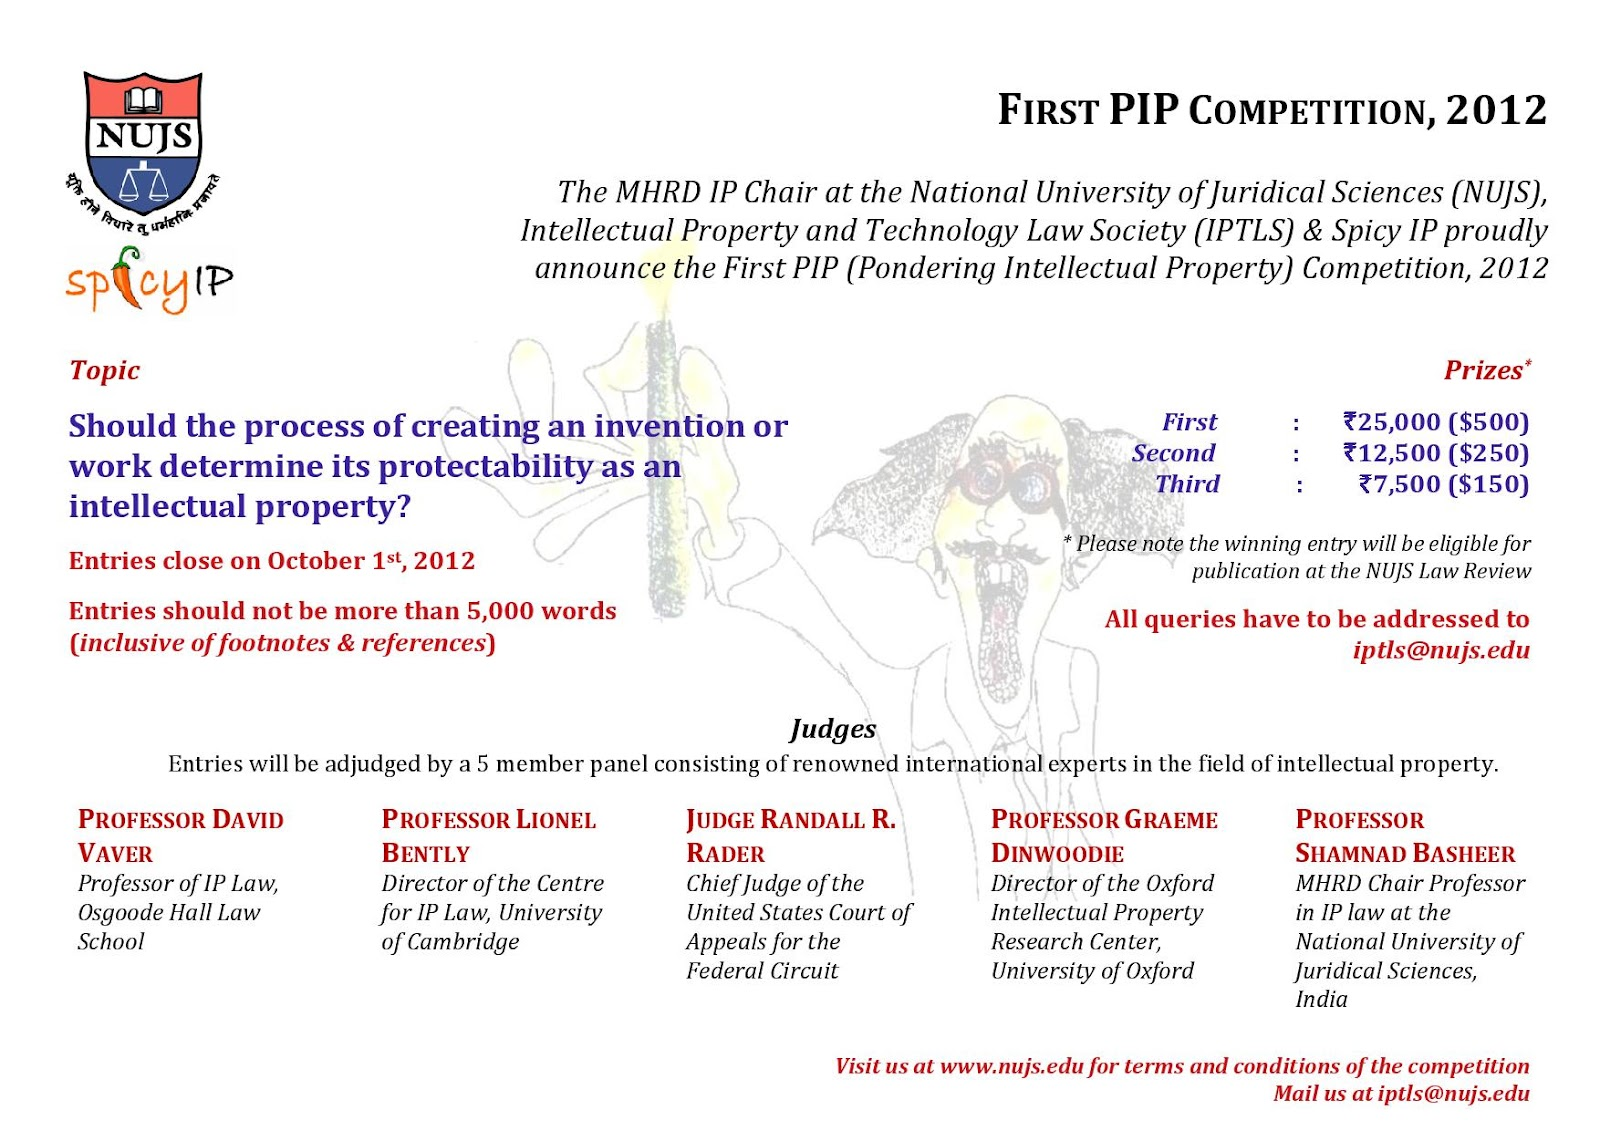 Extended essay deadlines 2012